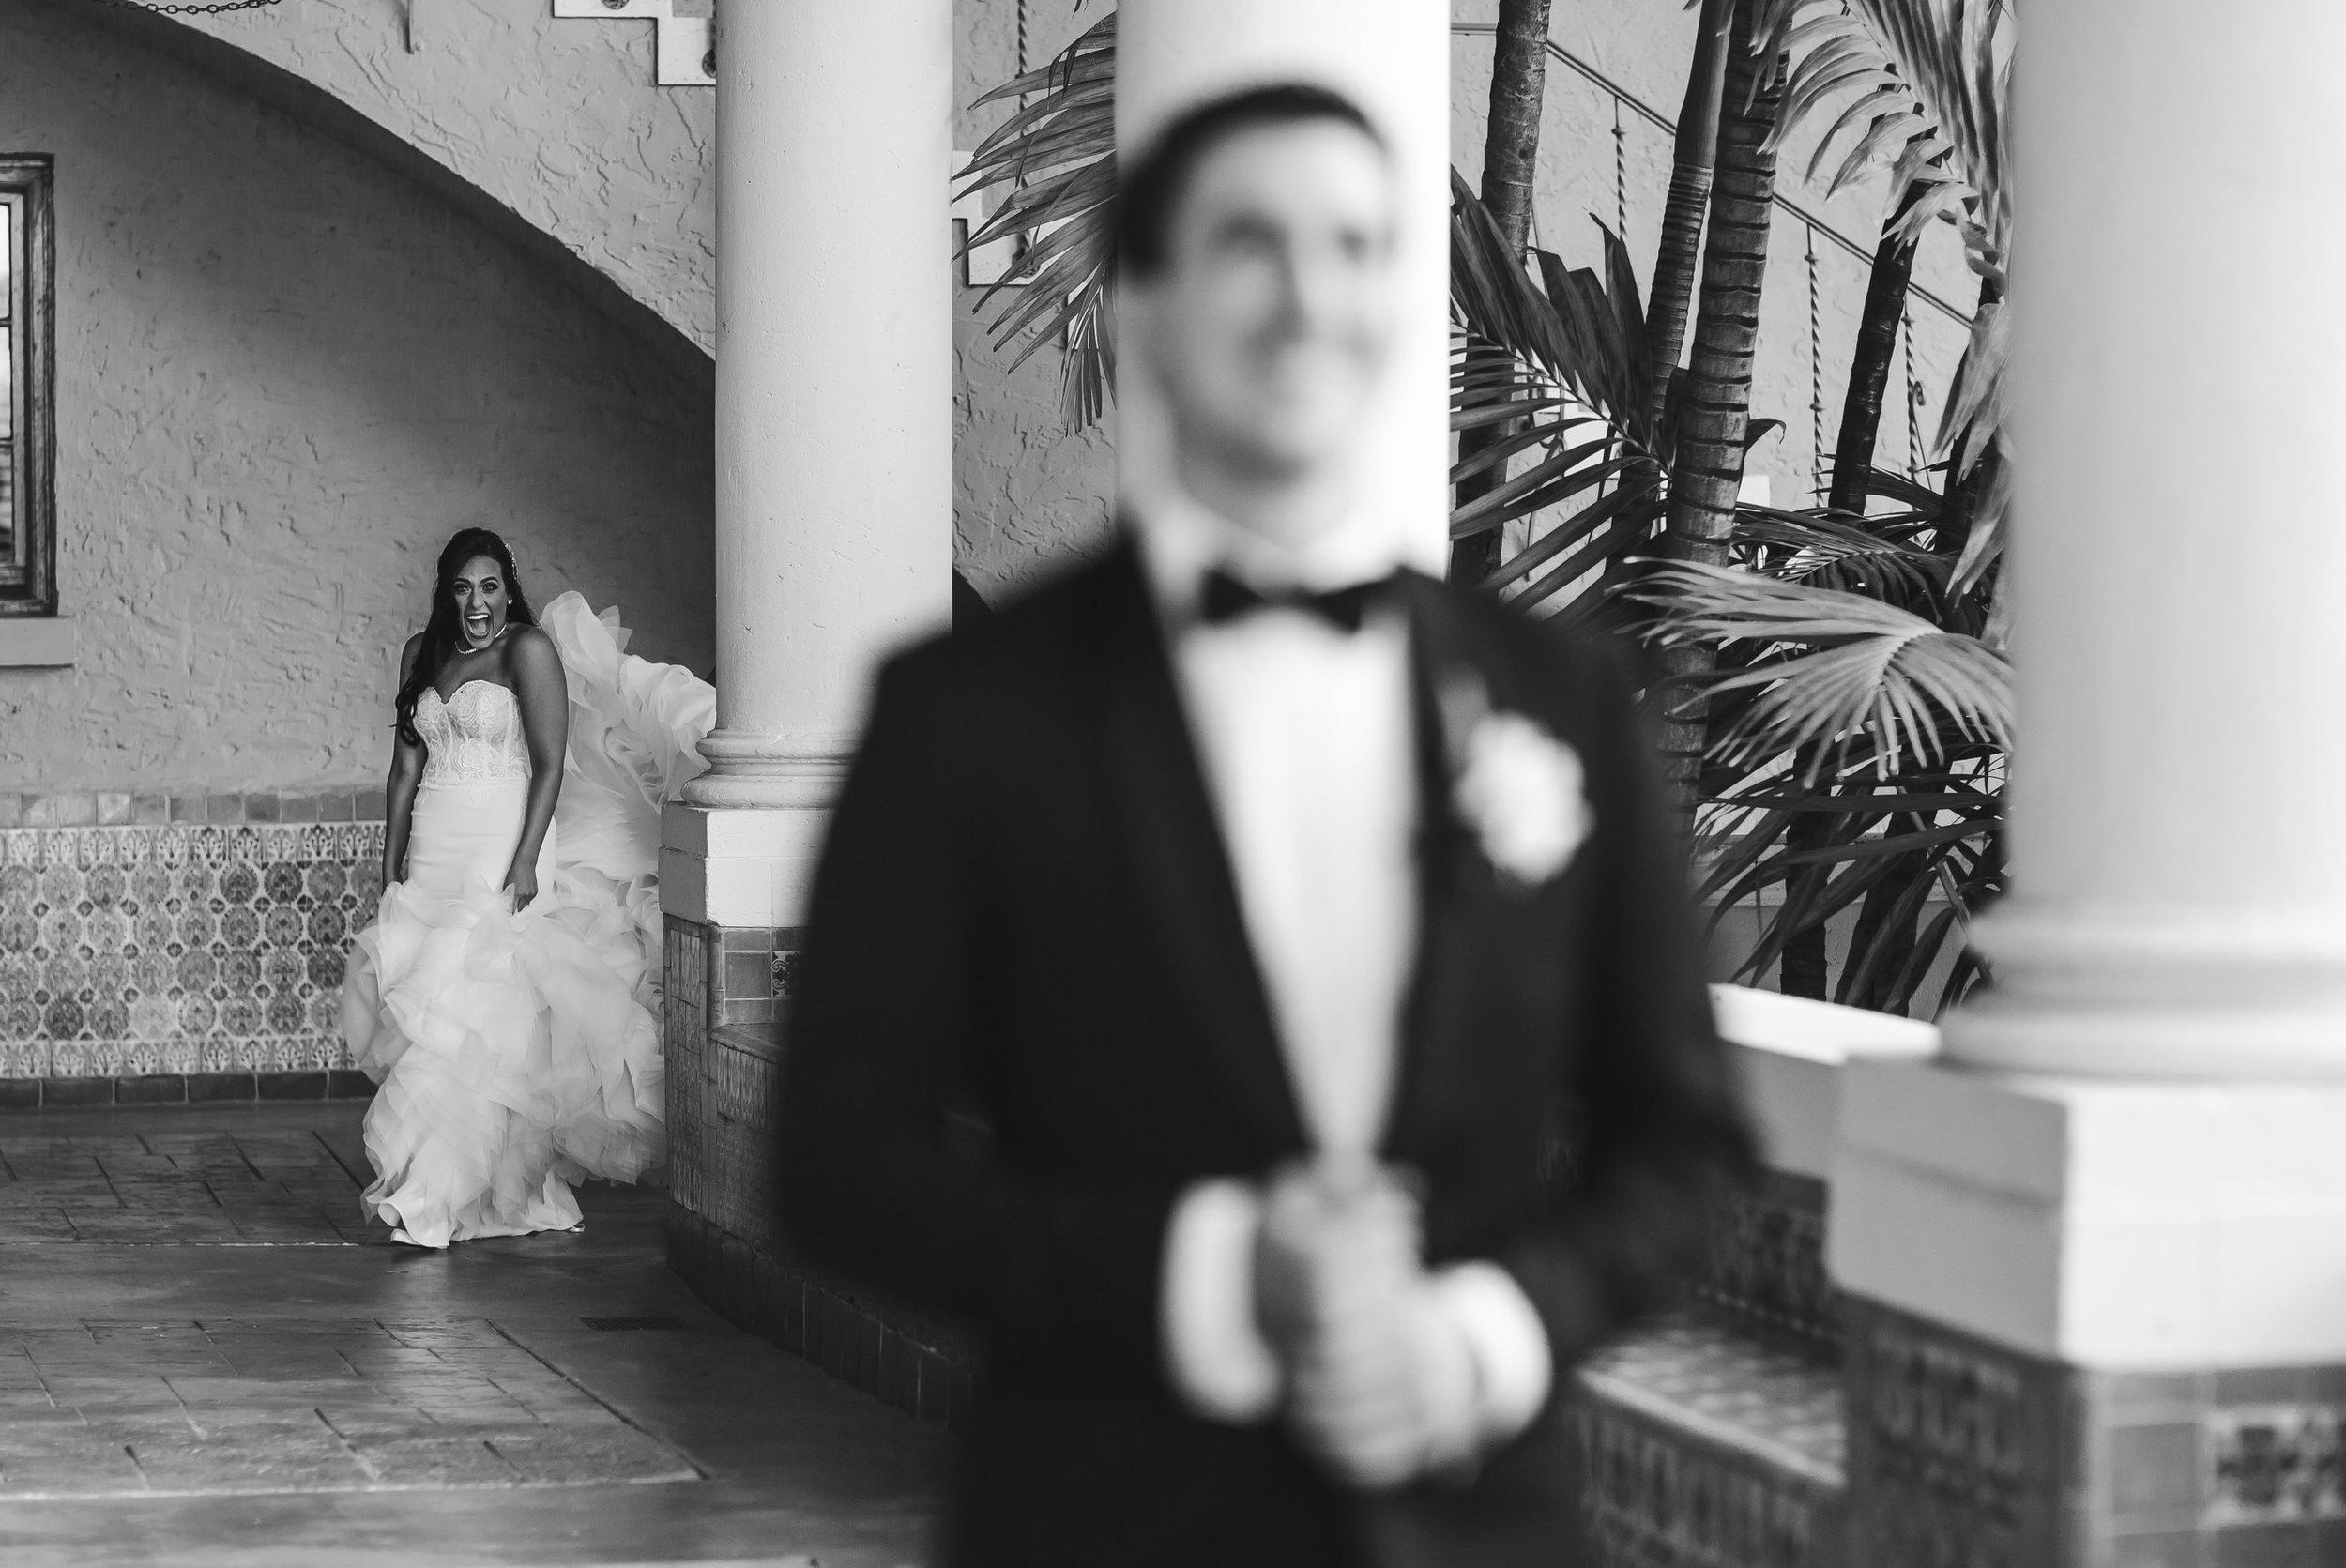 biltmore-wedding-steph-lynn-photo-photographer-bride-and-groom-3.jpg